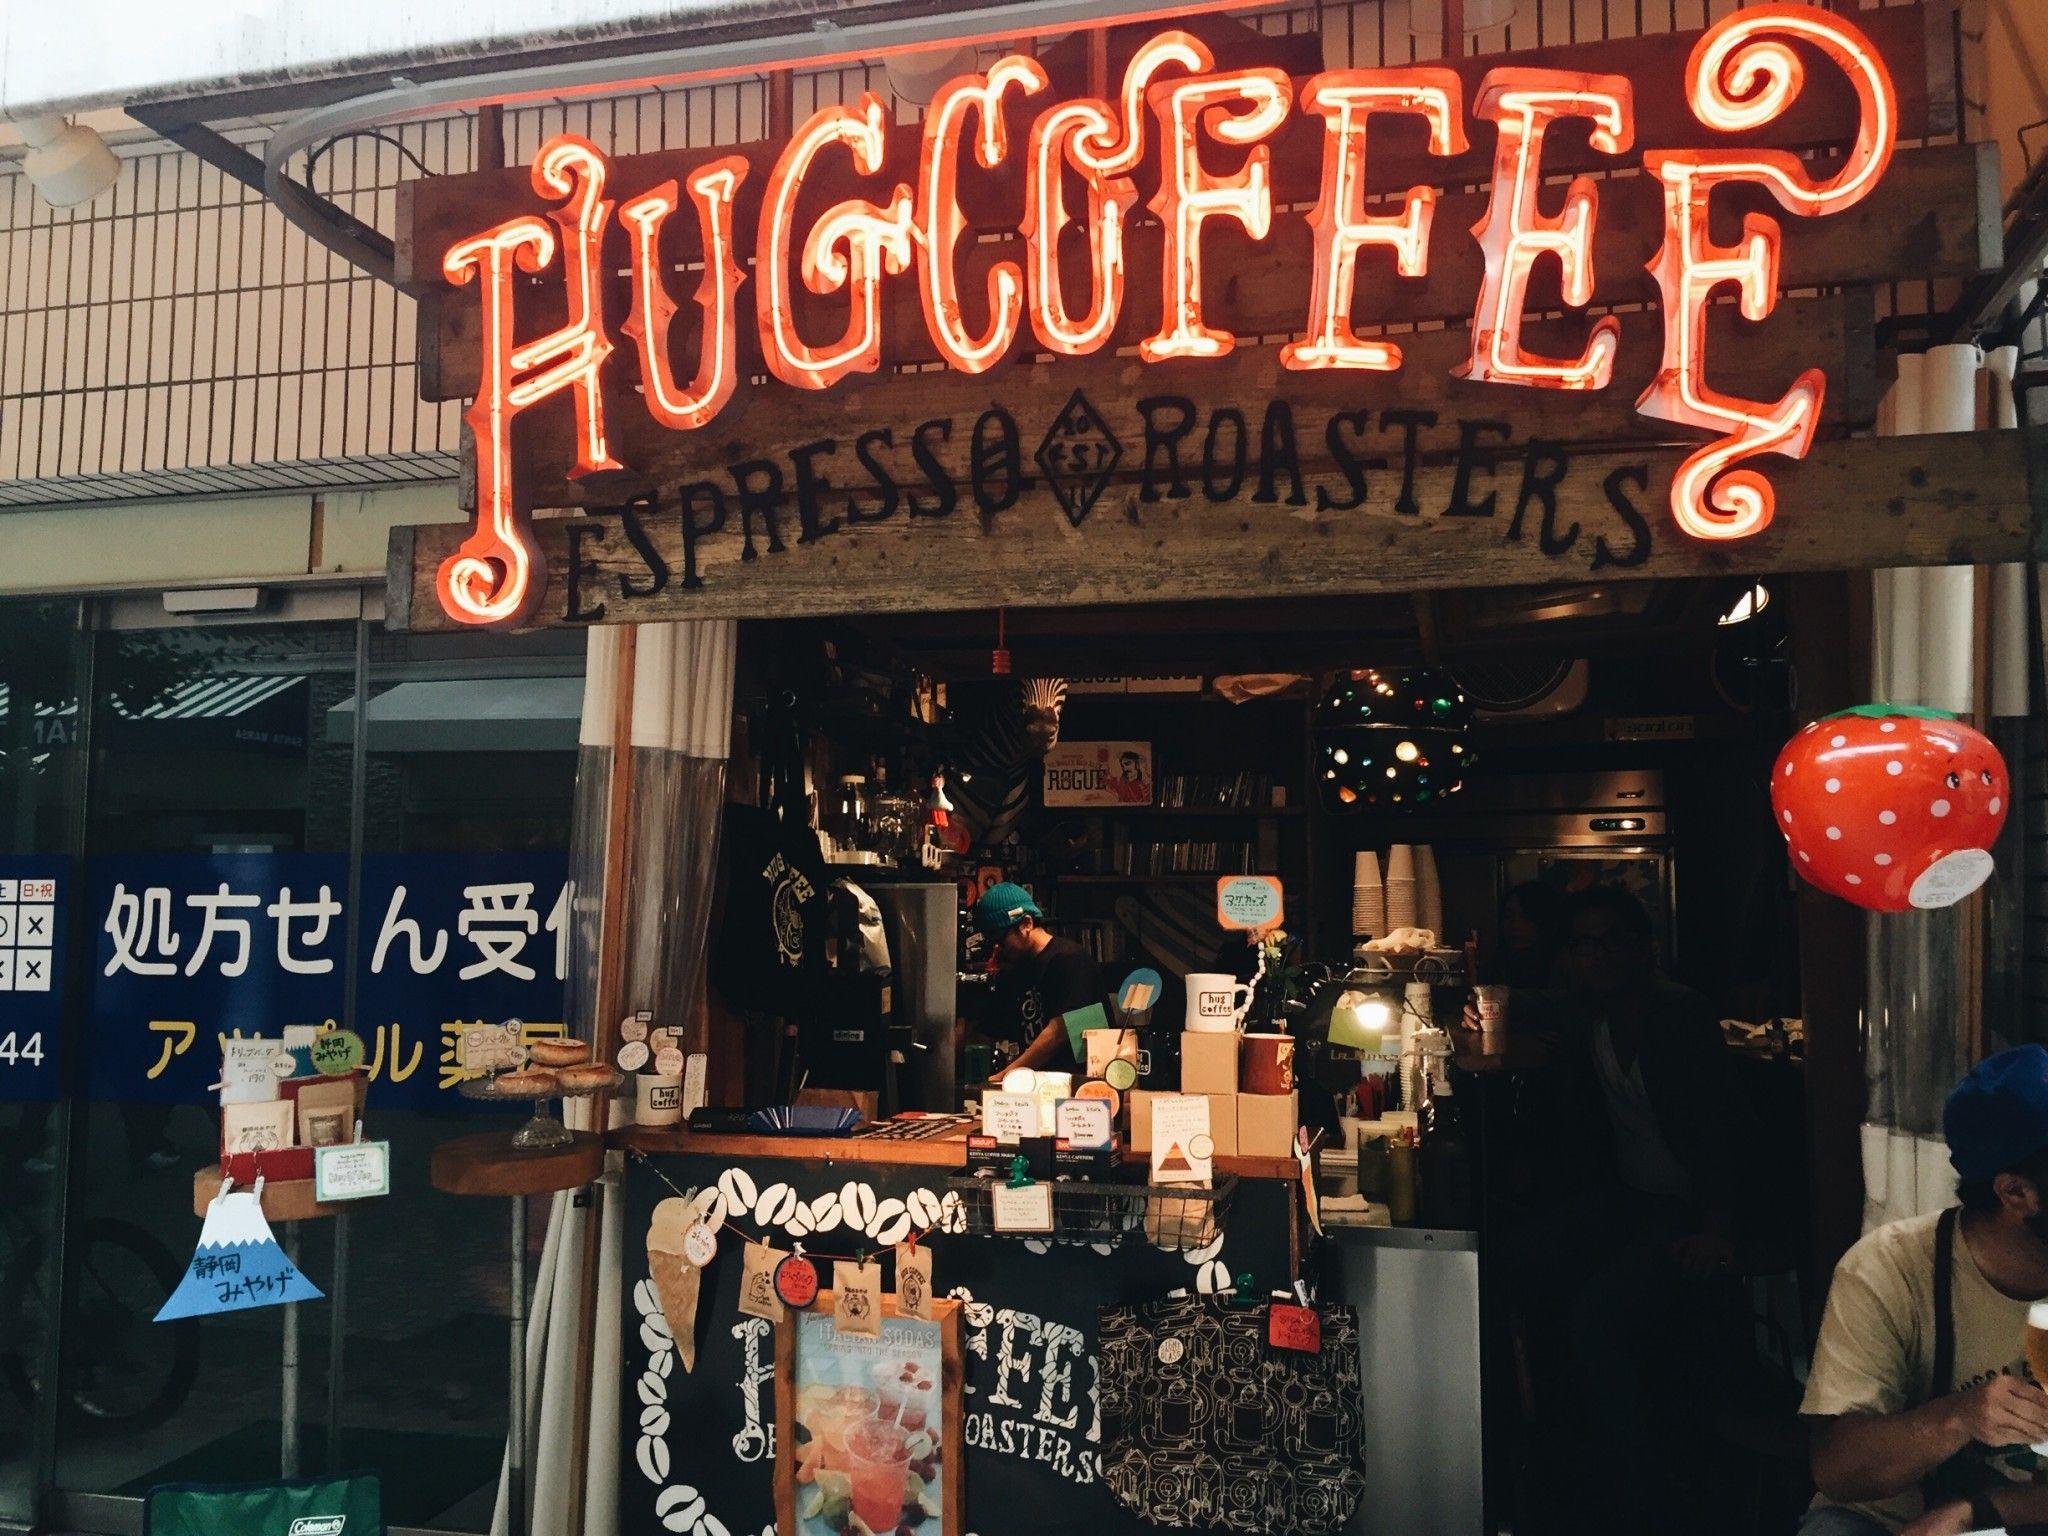 Hug Coffee: where art and artisanal coffee meet